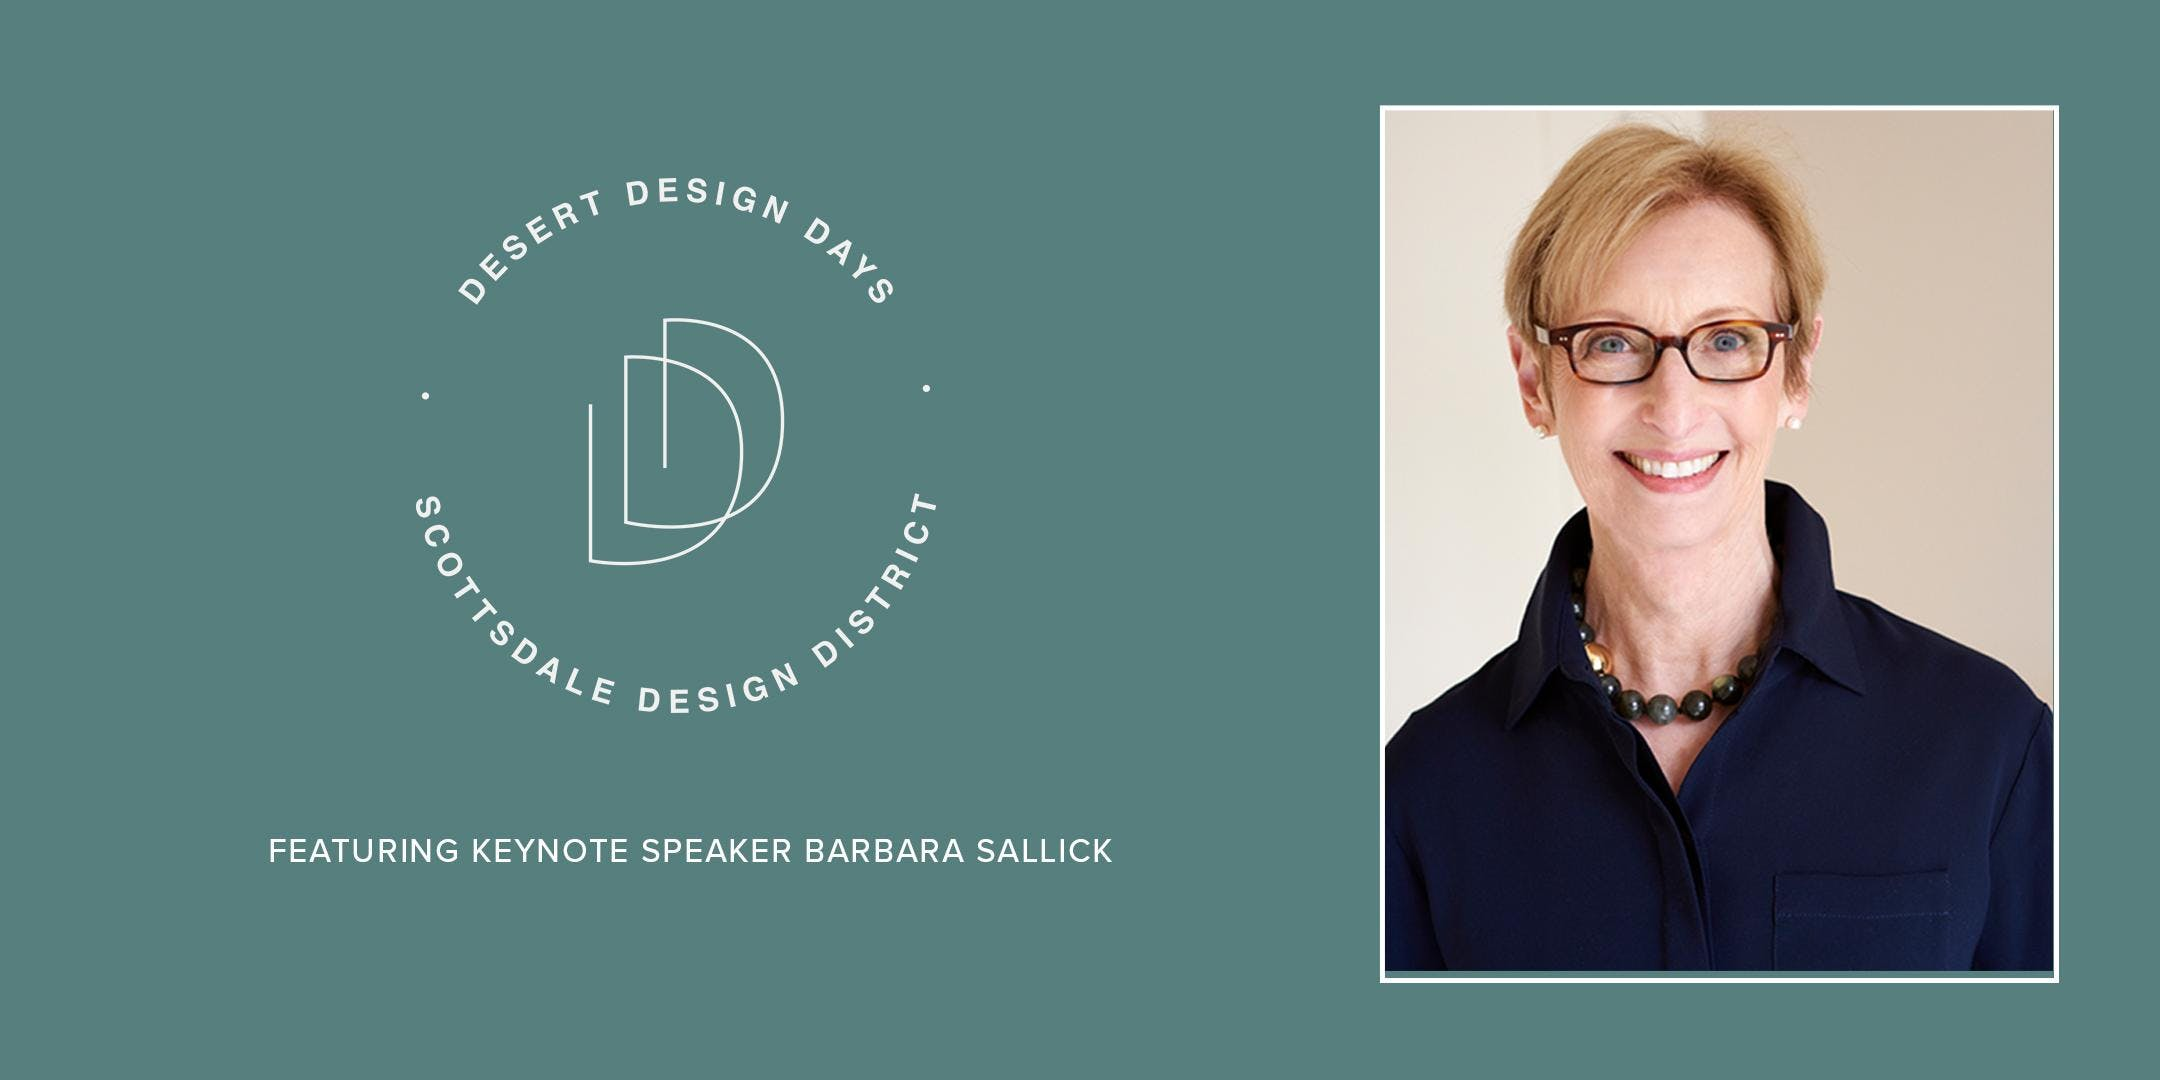 Desert Design Days: Barbara Sallick